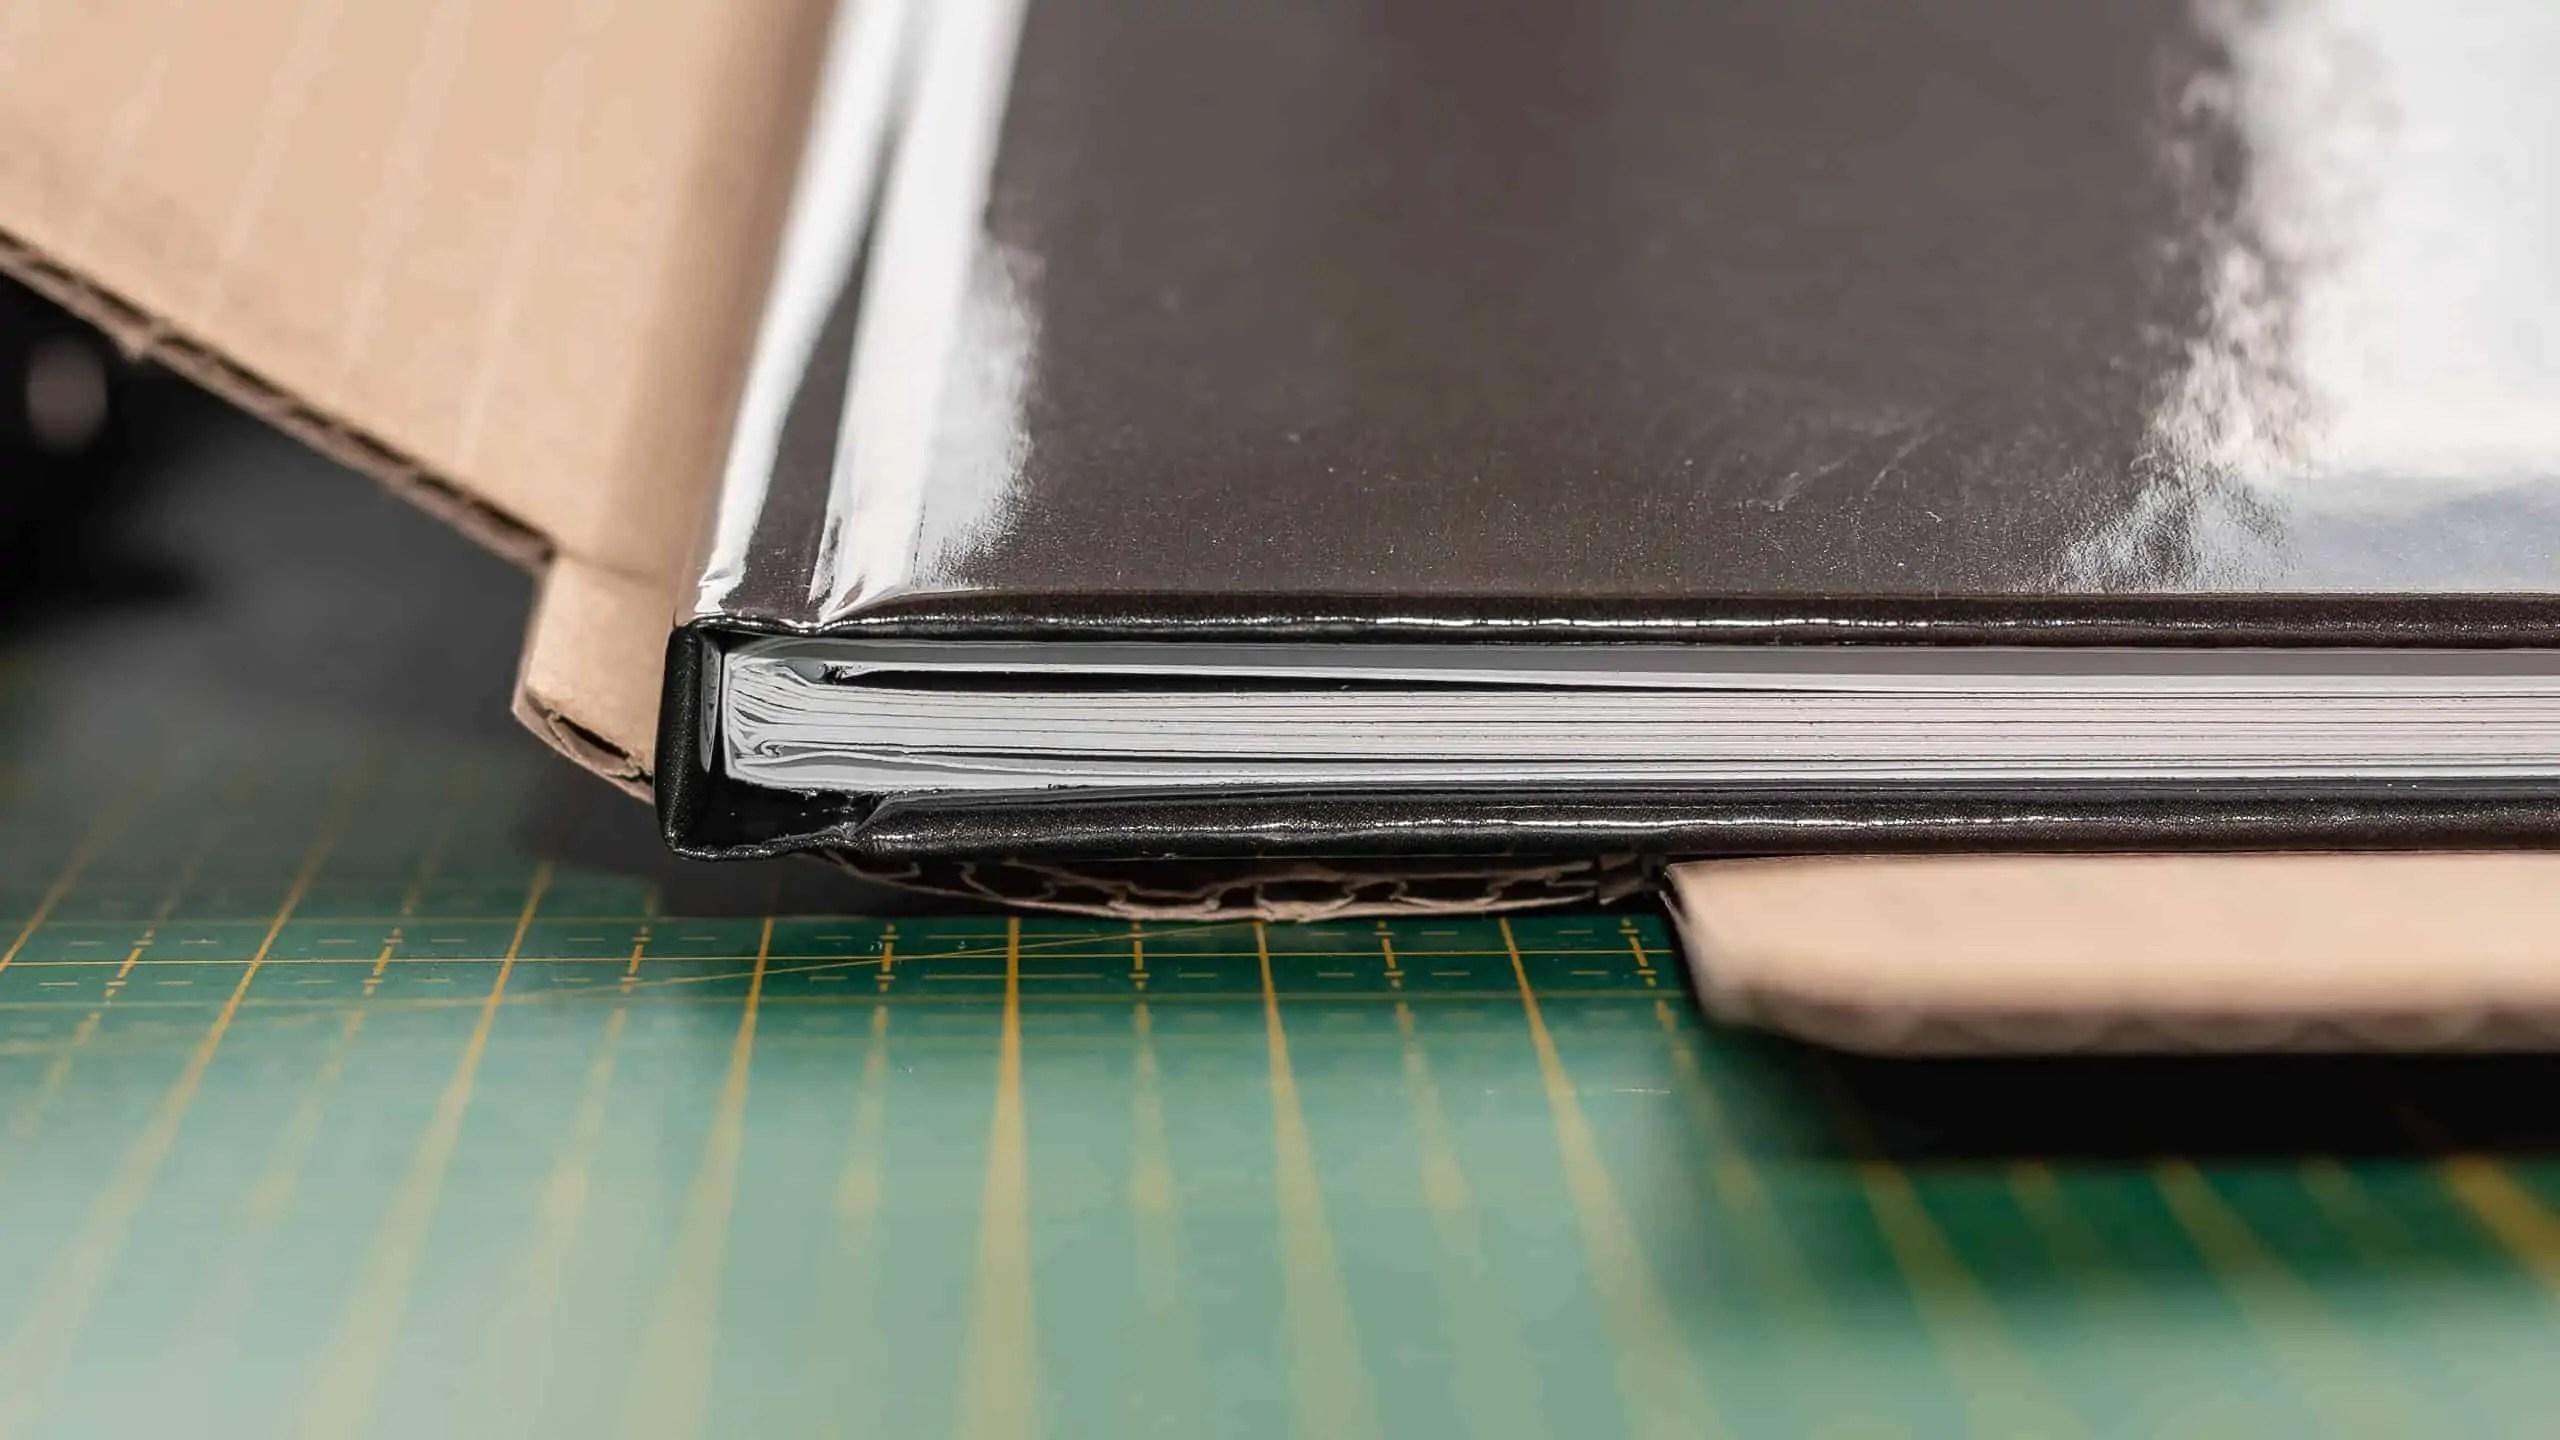 Saal design vs pixbook porównanie książek fotograficznych 4 - Saal design, pixbook - książki fotograficzne